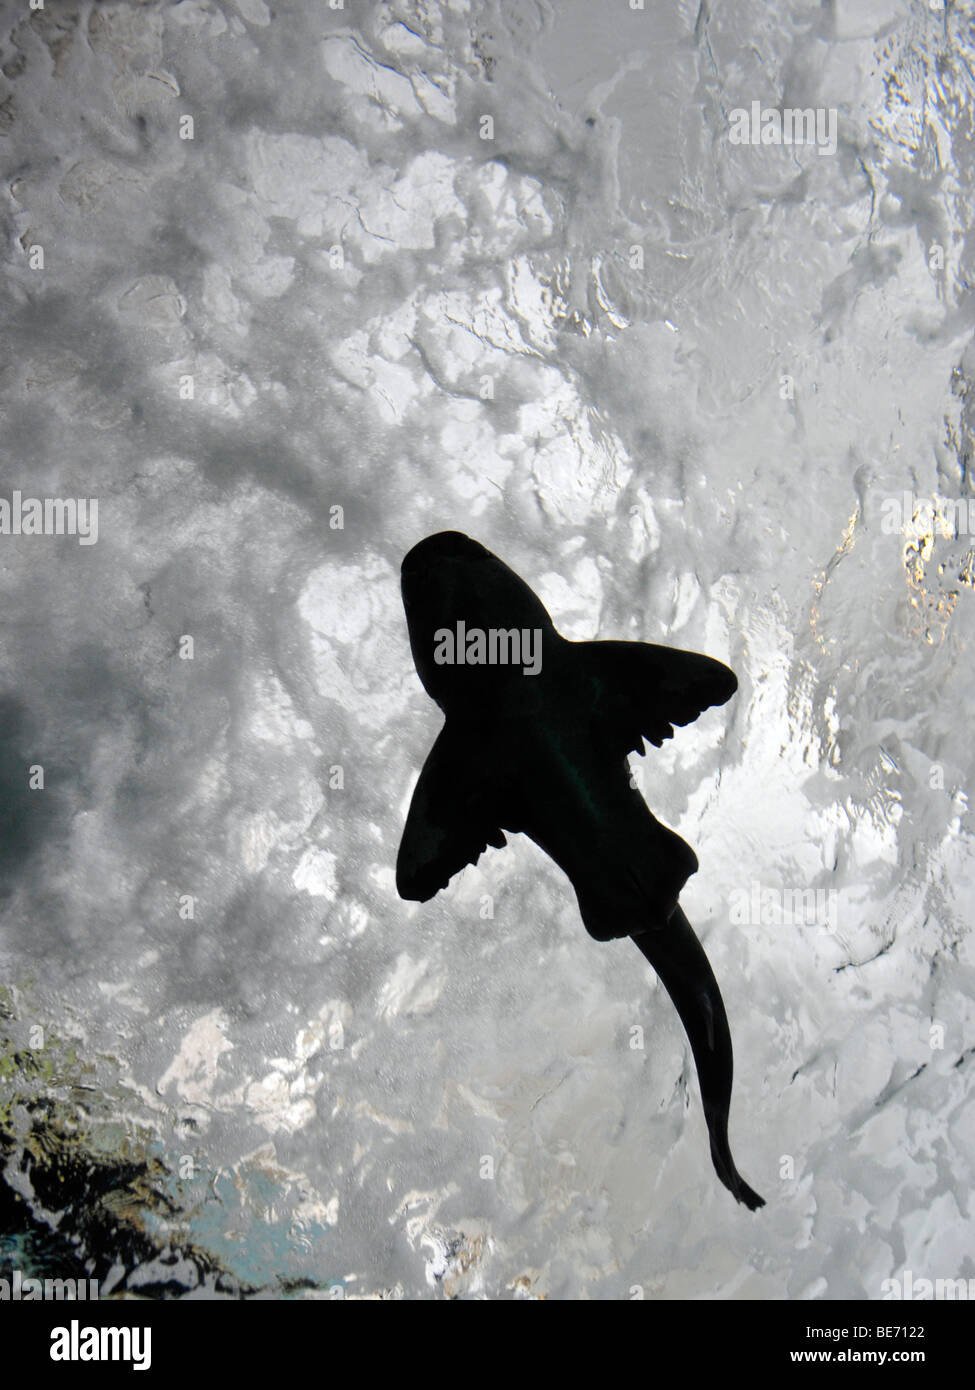 Bottom view of a Port Jackson shark (Heterodontus portusjacksoni) in an acrylic tunnel, large display aquarium, - Stock Image